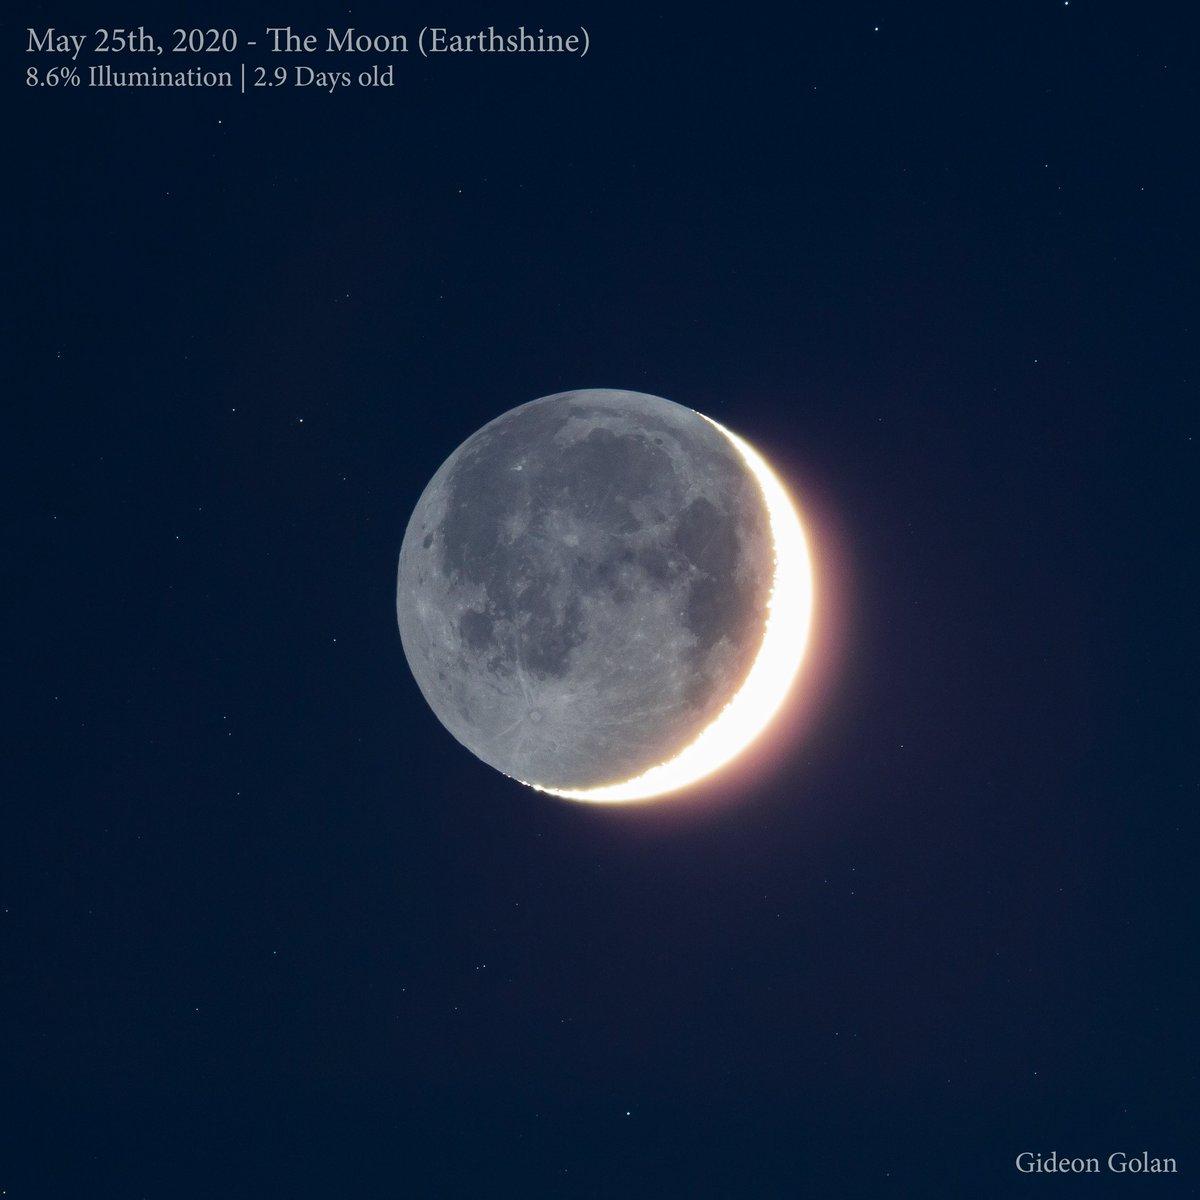 Last Night's #Moon & Earthshine  8.6% Illumination   2.9 Days old  Single Exp (ISO100, 6 Secs. tracked) #canon 60D   AT60ED (360, f/6)   #nightsky #astronomy #moon #lookupinthesky #astrophotography #nightpic.twitter.com/3YnvudnUHl